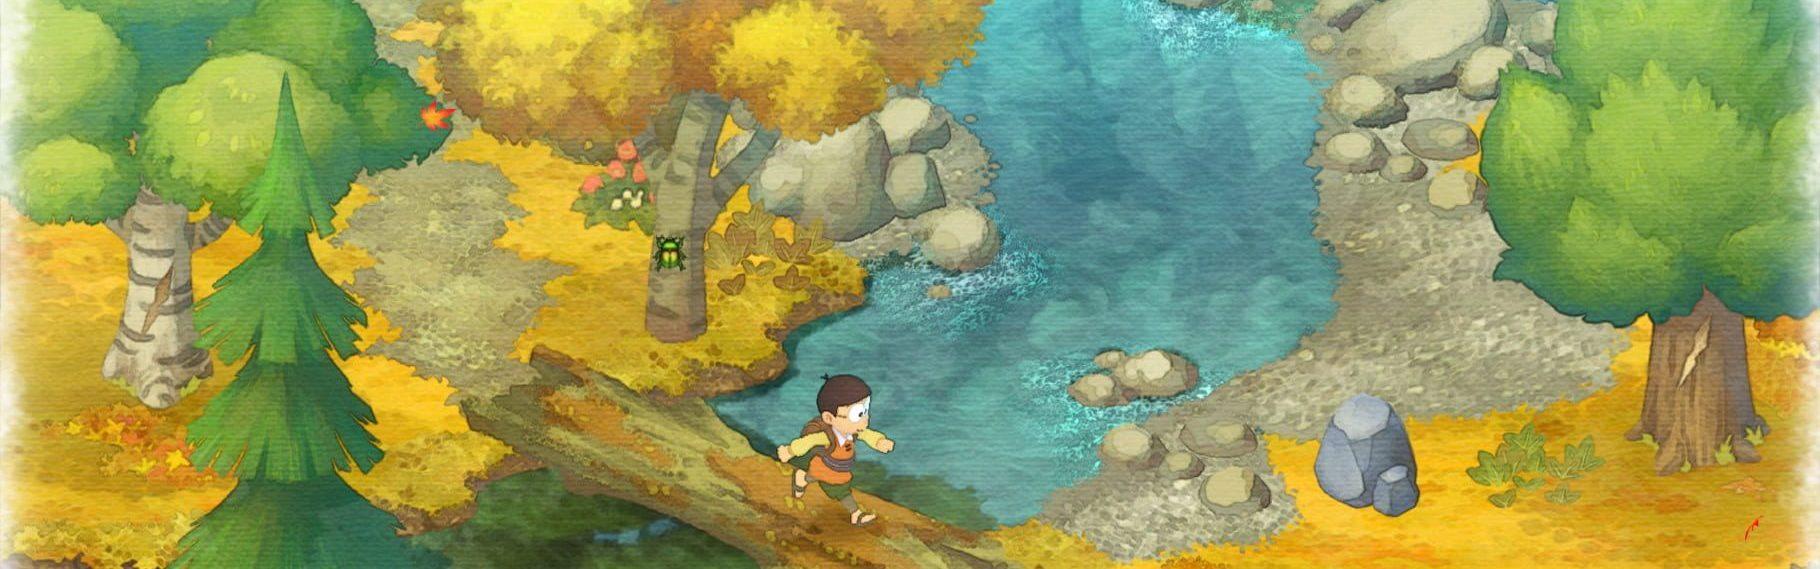 Doraemon Story of Seasons Steam Key GLOBAL